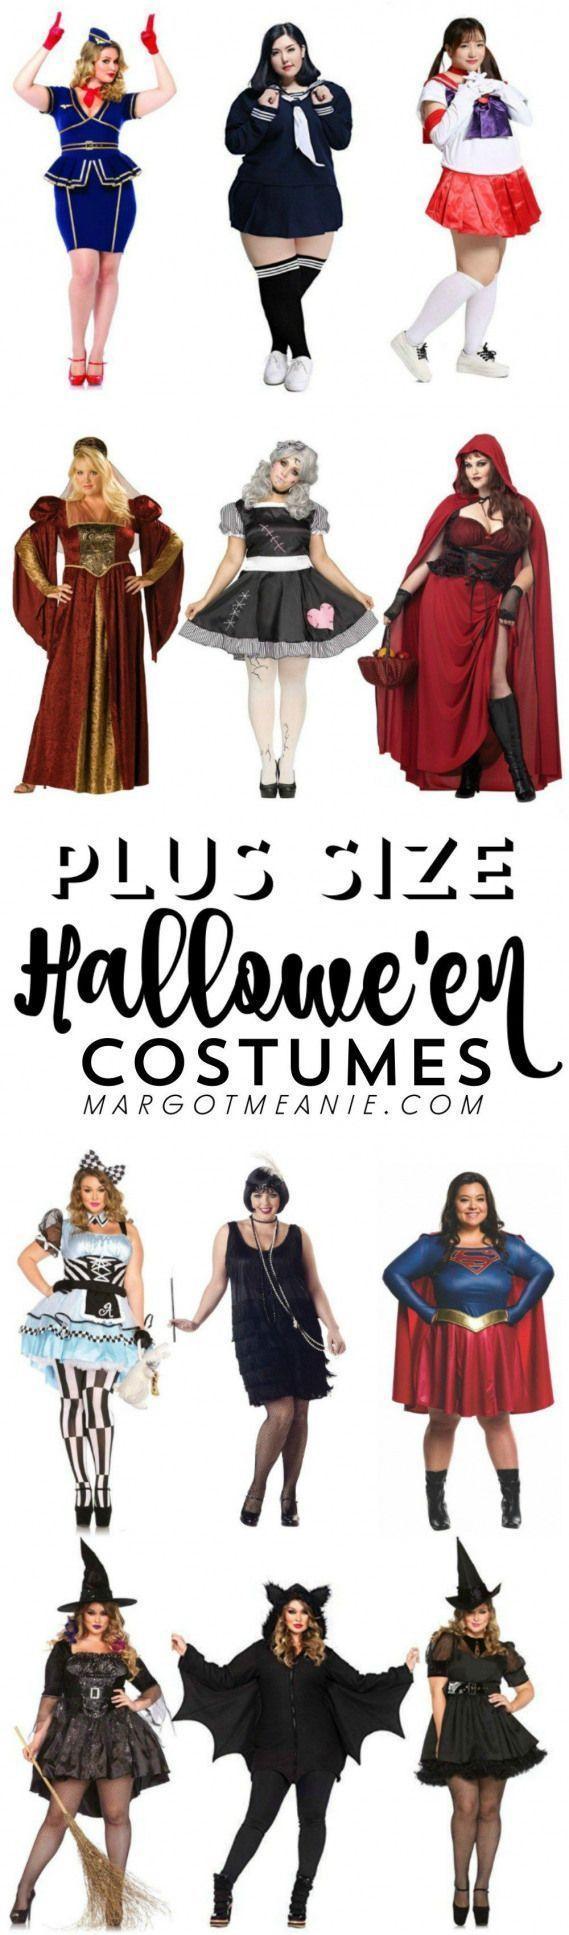 Plus Size Halloween Kostüme von Amazon halloweencostume